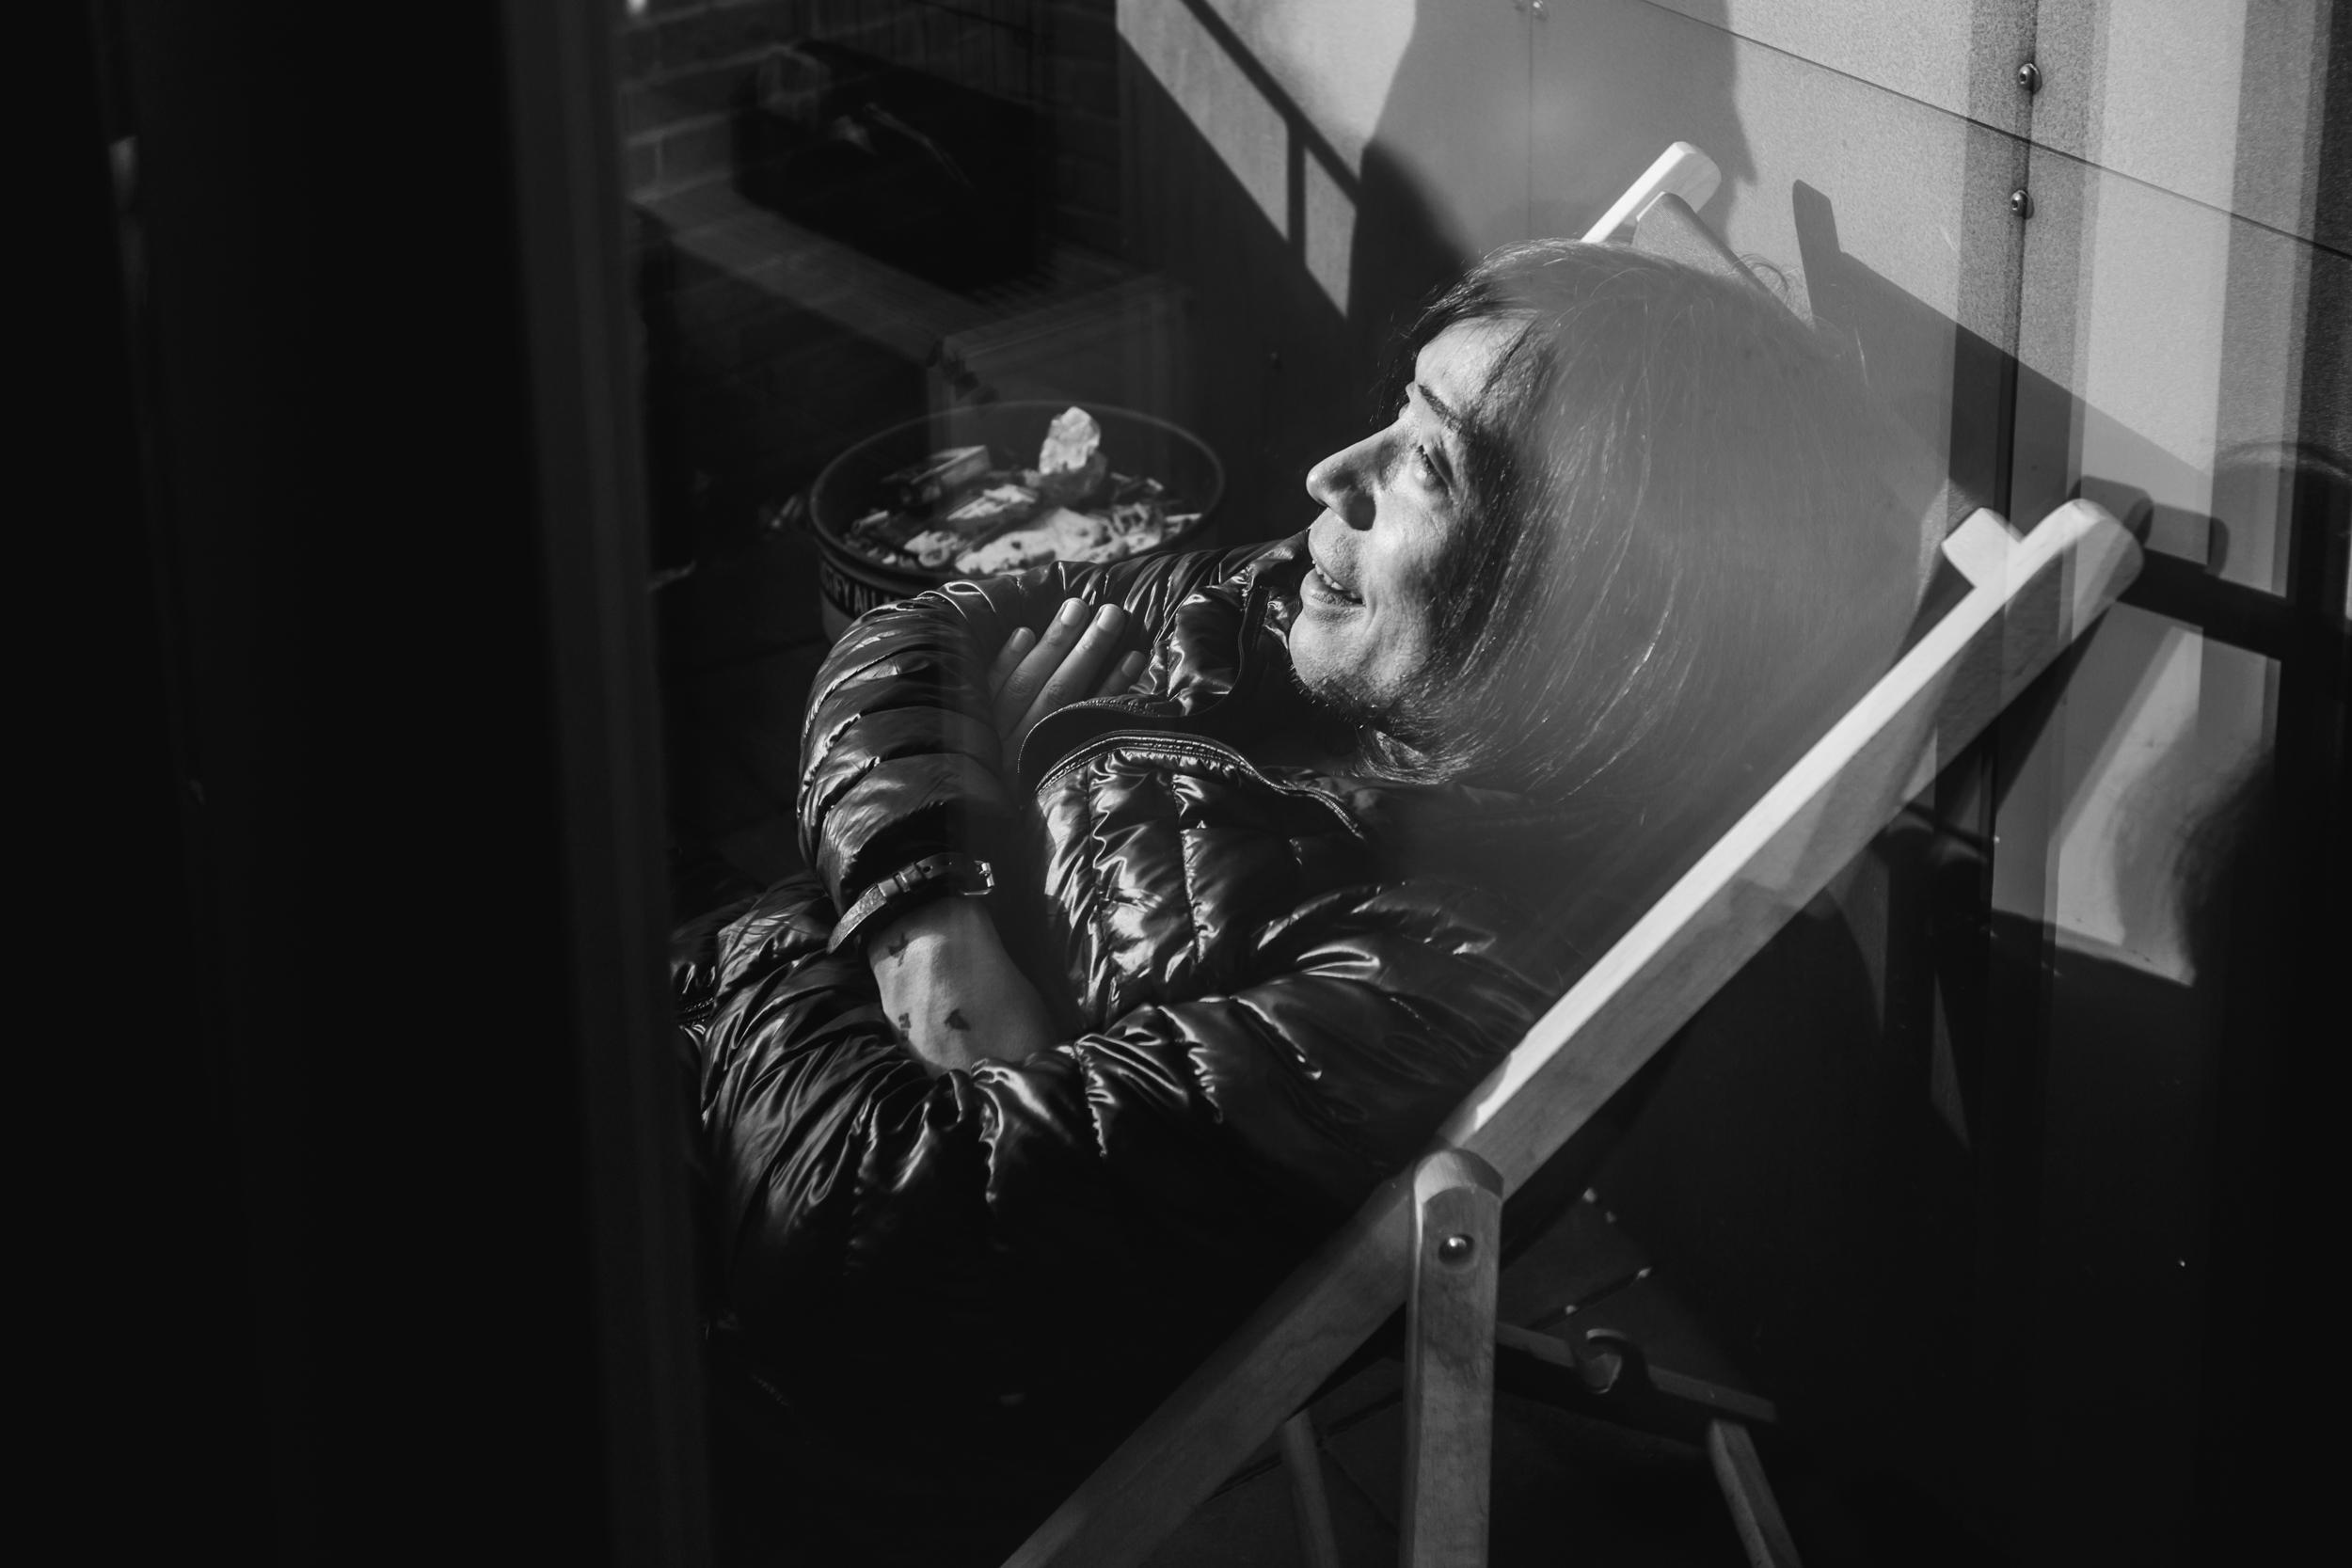 Taka enjoying the sun on the venue's balcony